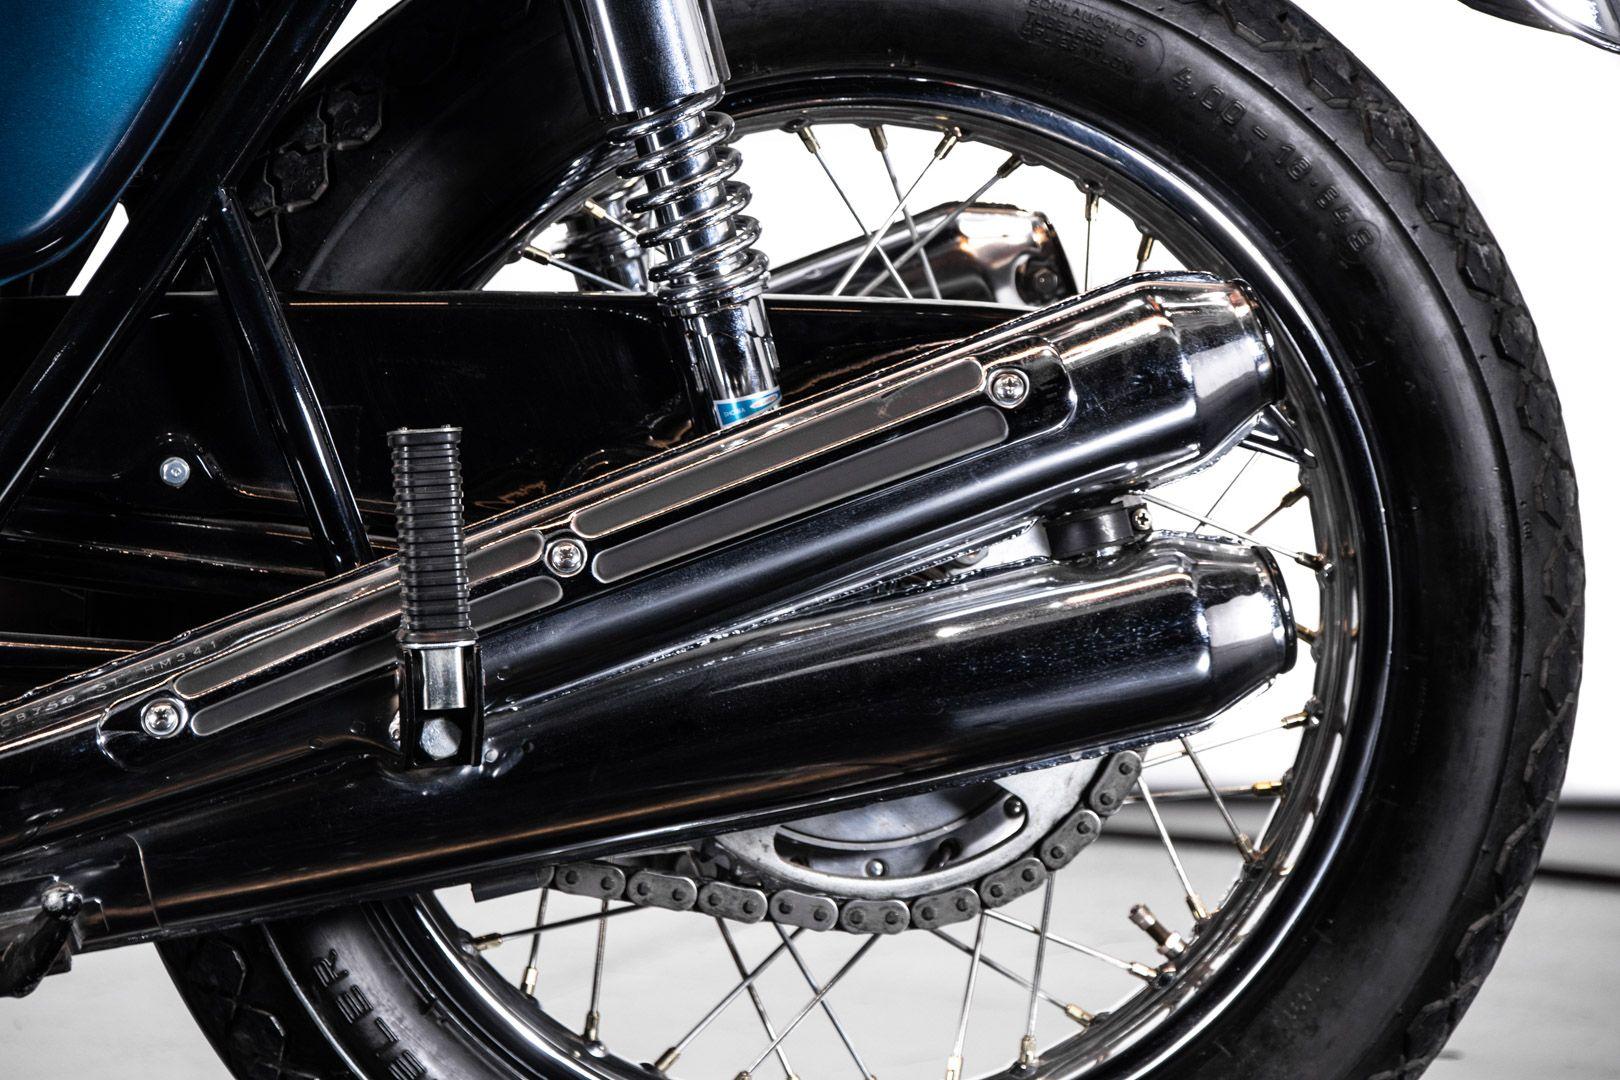 1972 Honda CB 750 Four G K2 83934